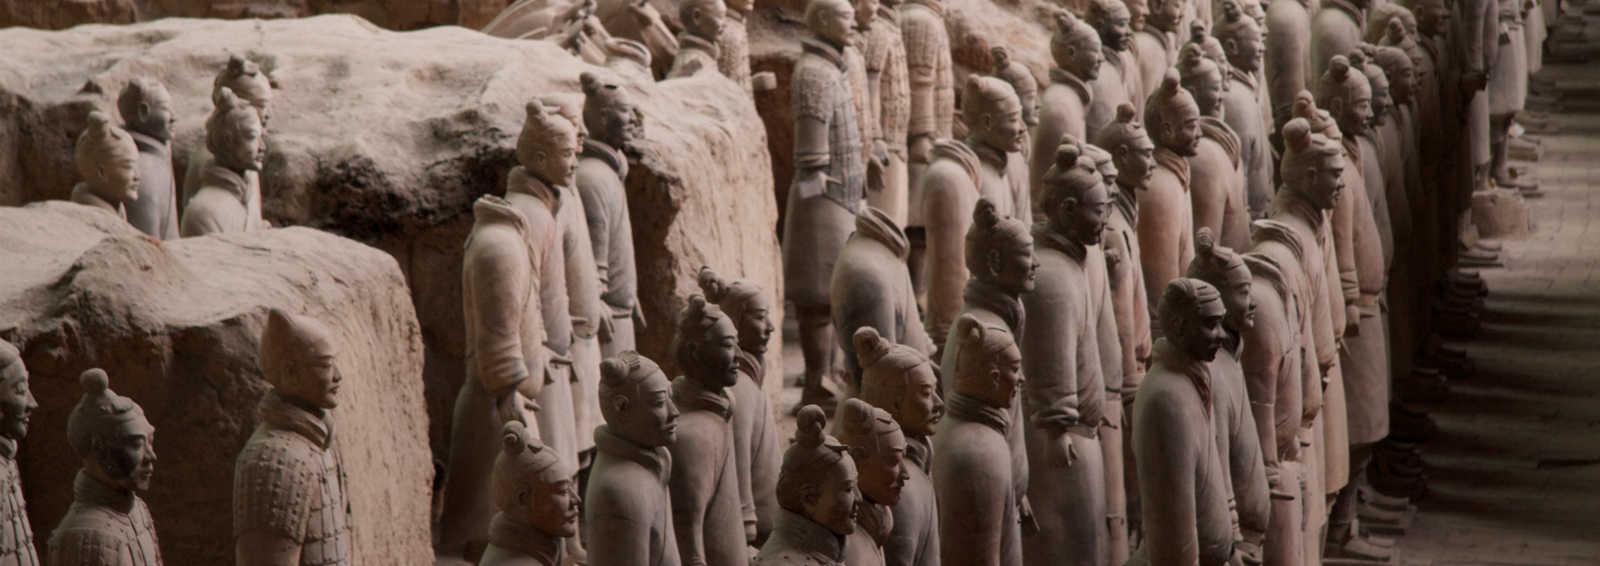 The Terracotta Warriors, Xian